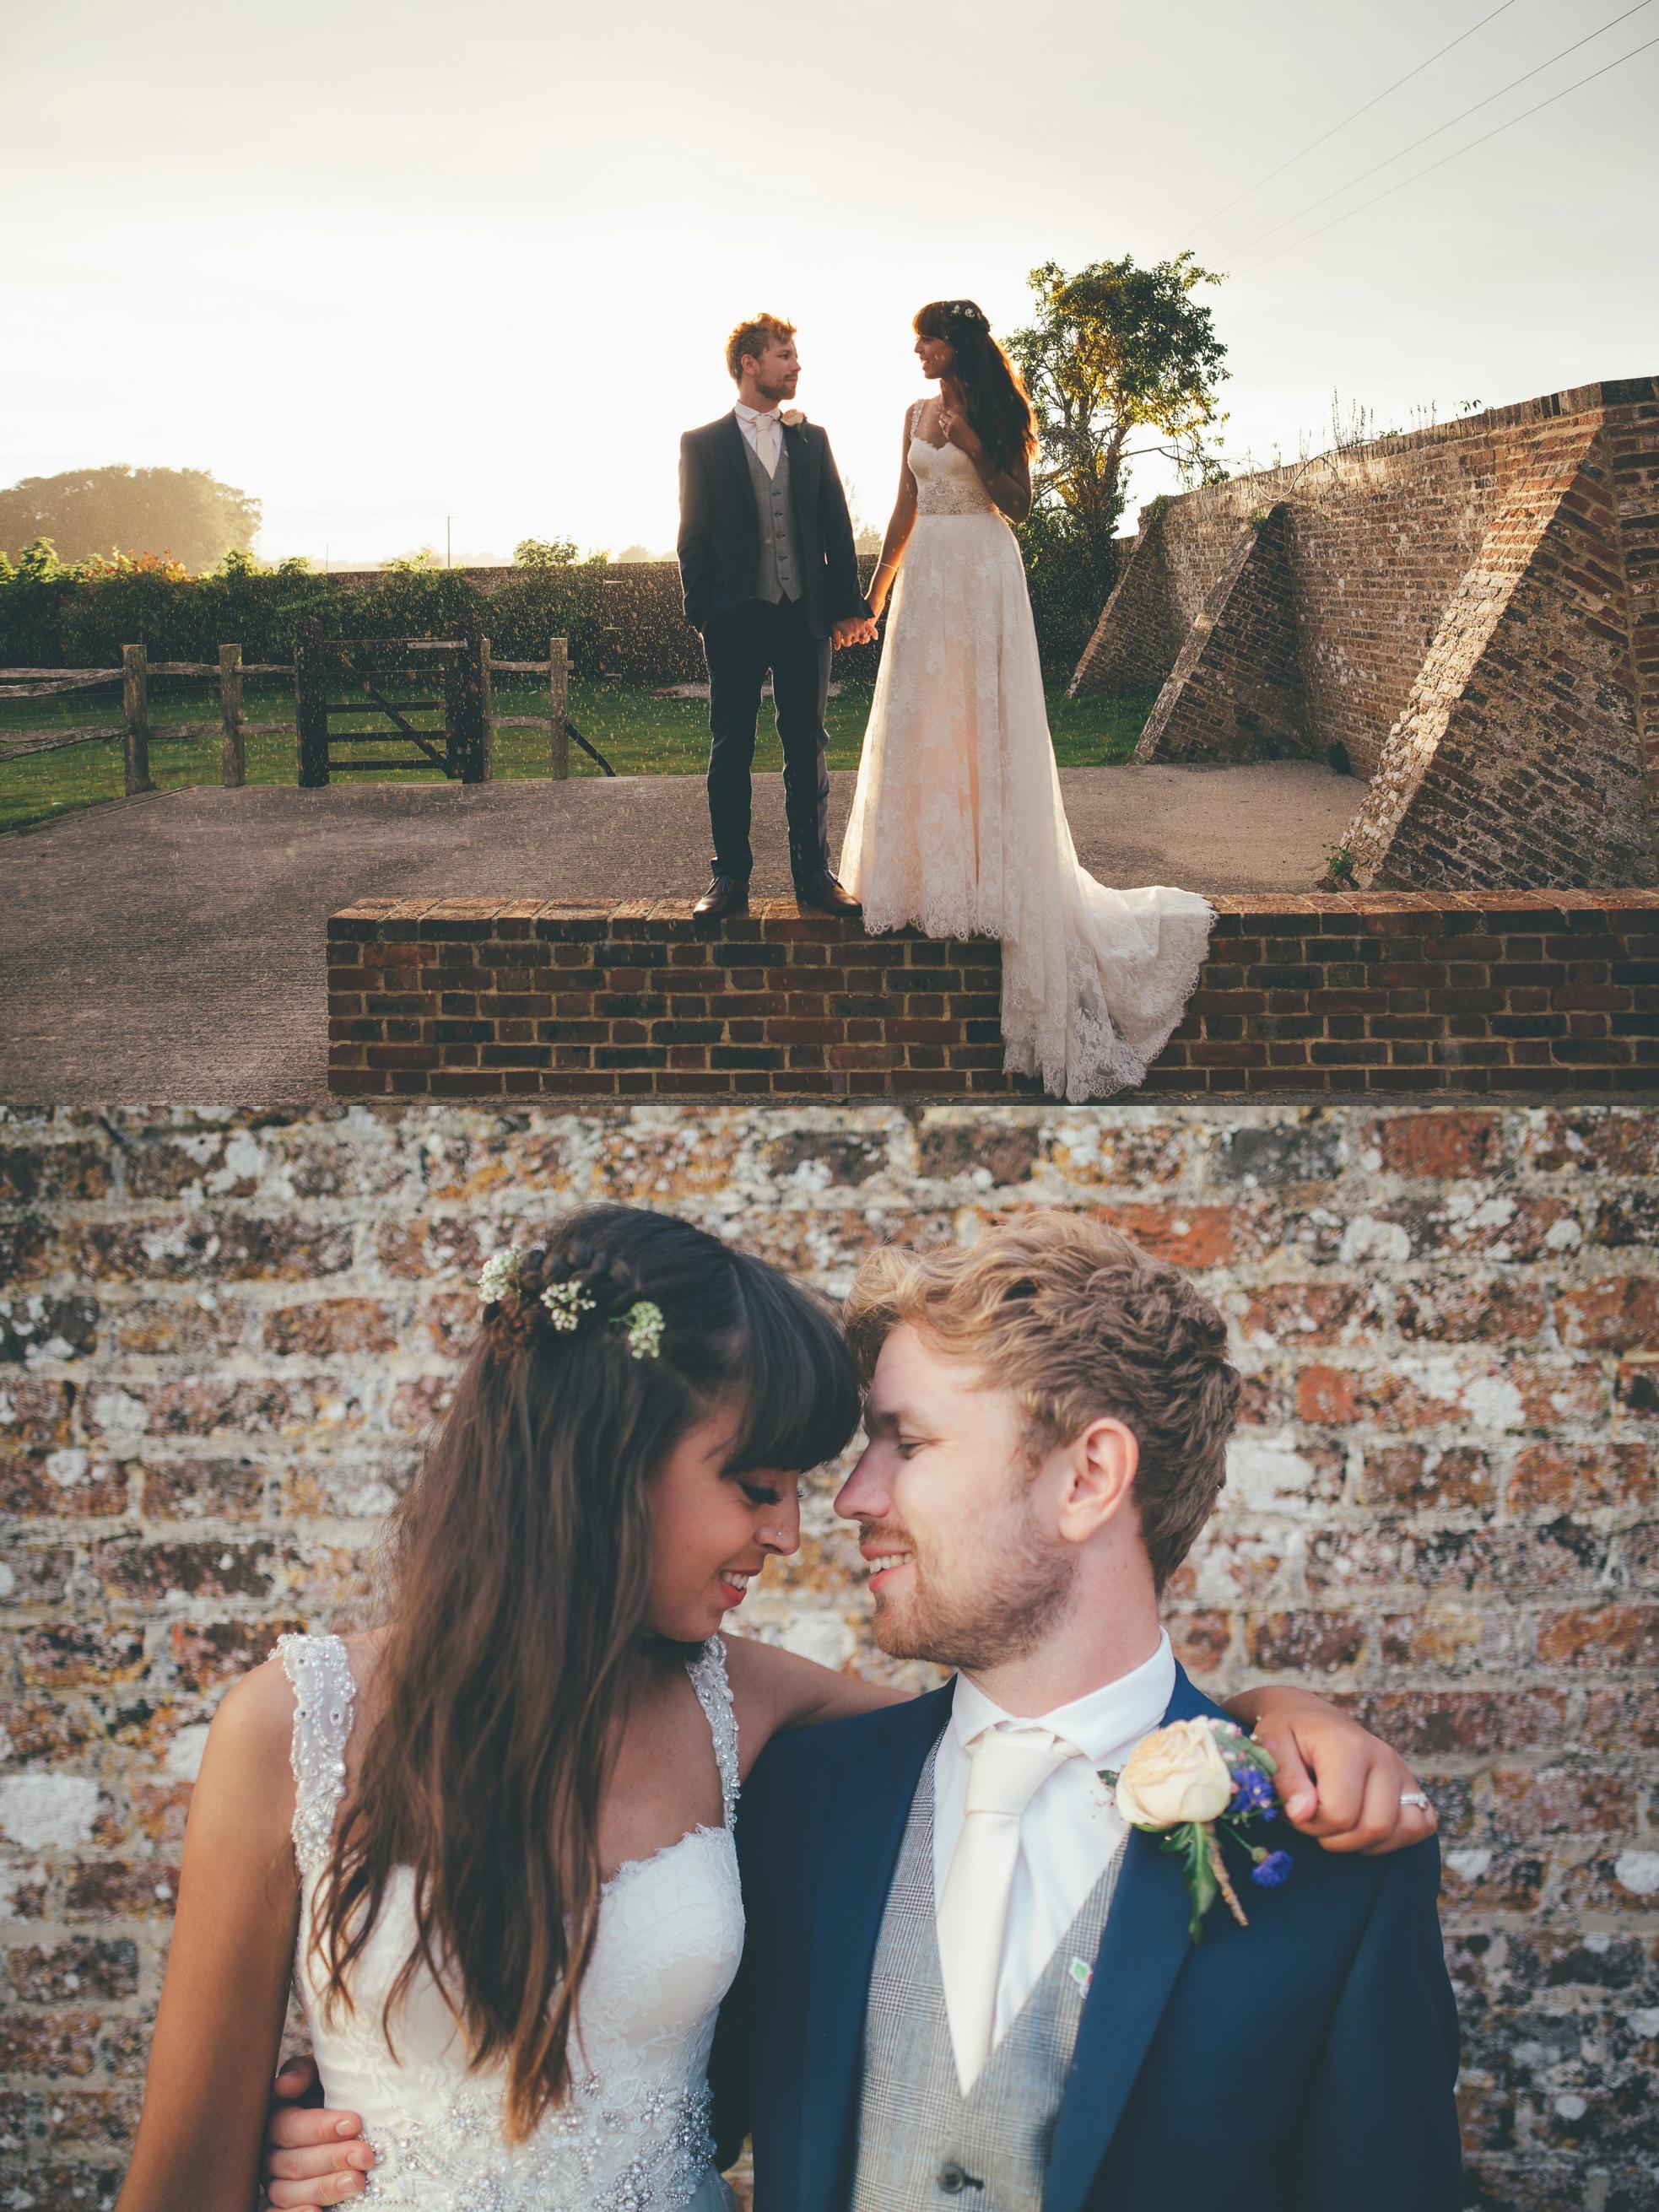 Richard&Sereena_BroylePlace_0055.jpg